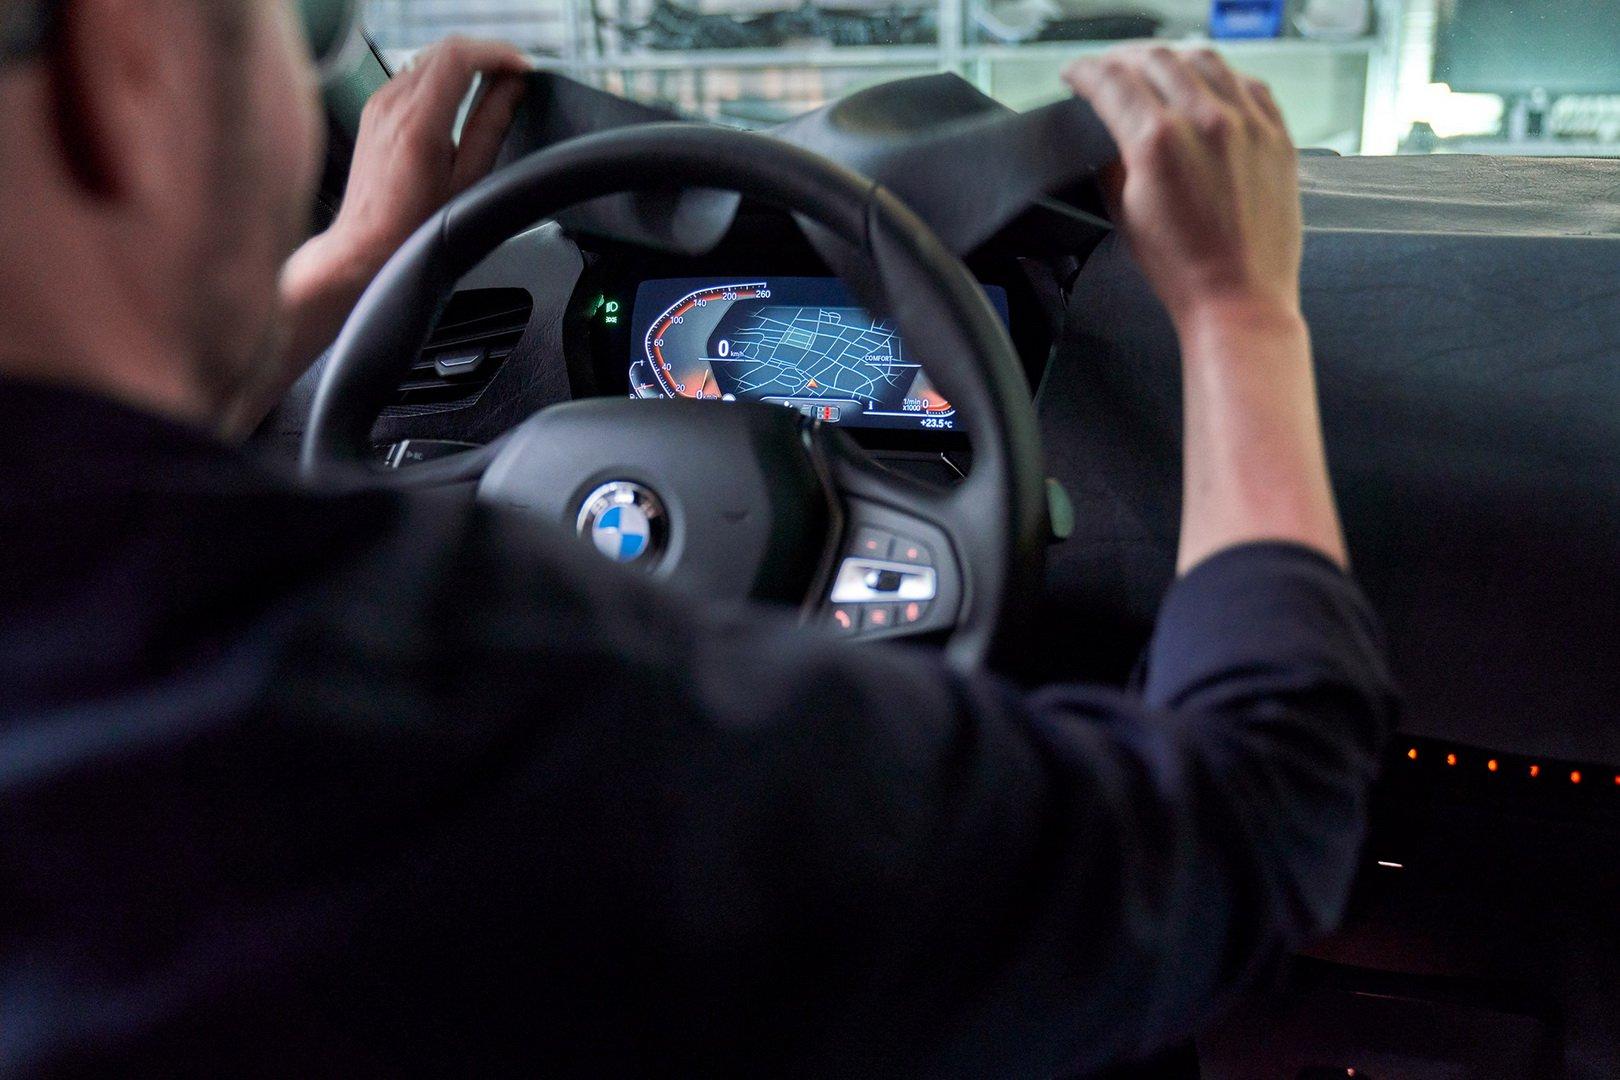 2019 BMW 1 Series image 4